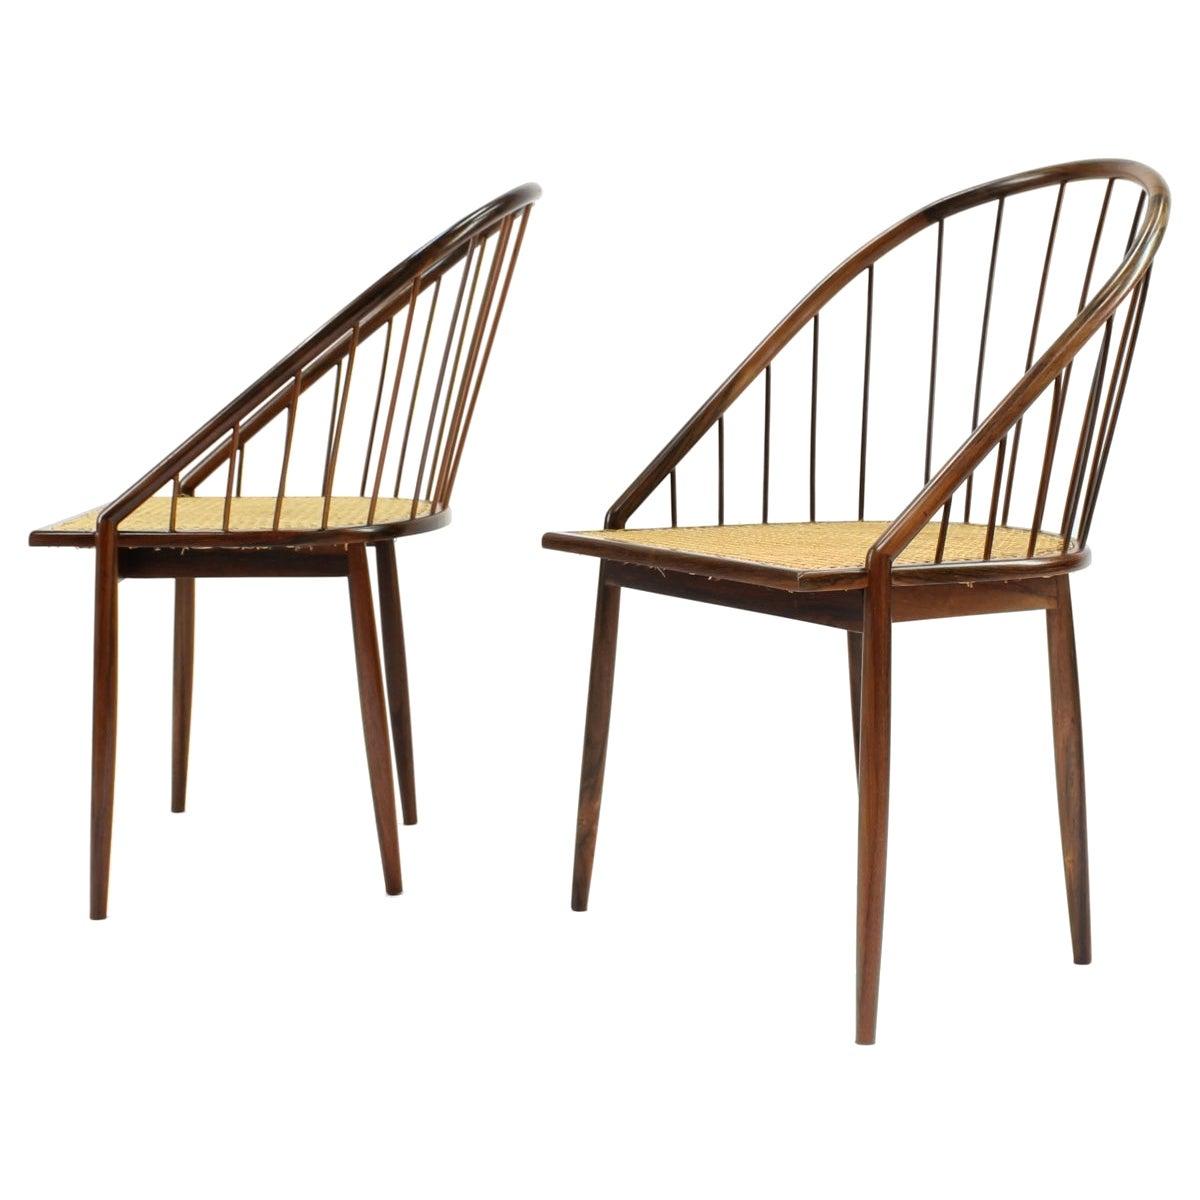 Set of Six '6' Brazilian Modern Curva Chairs by Joaquim Tenreiro